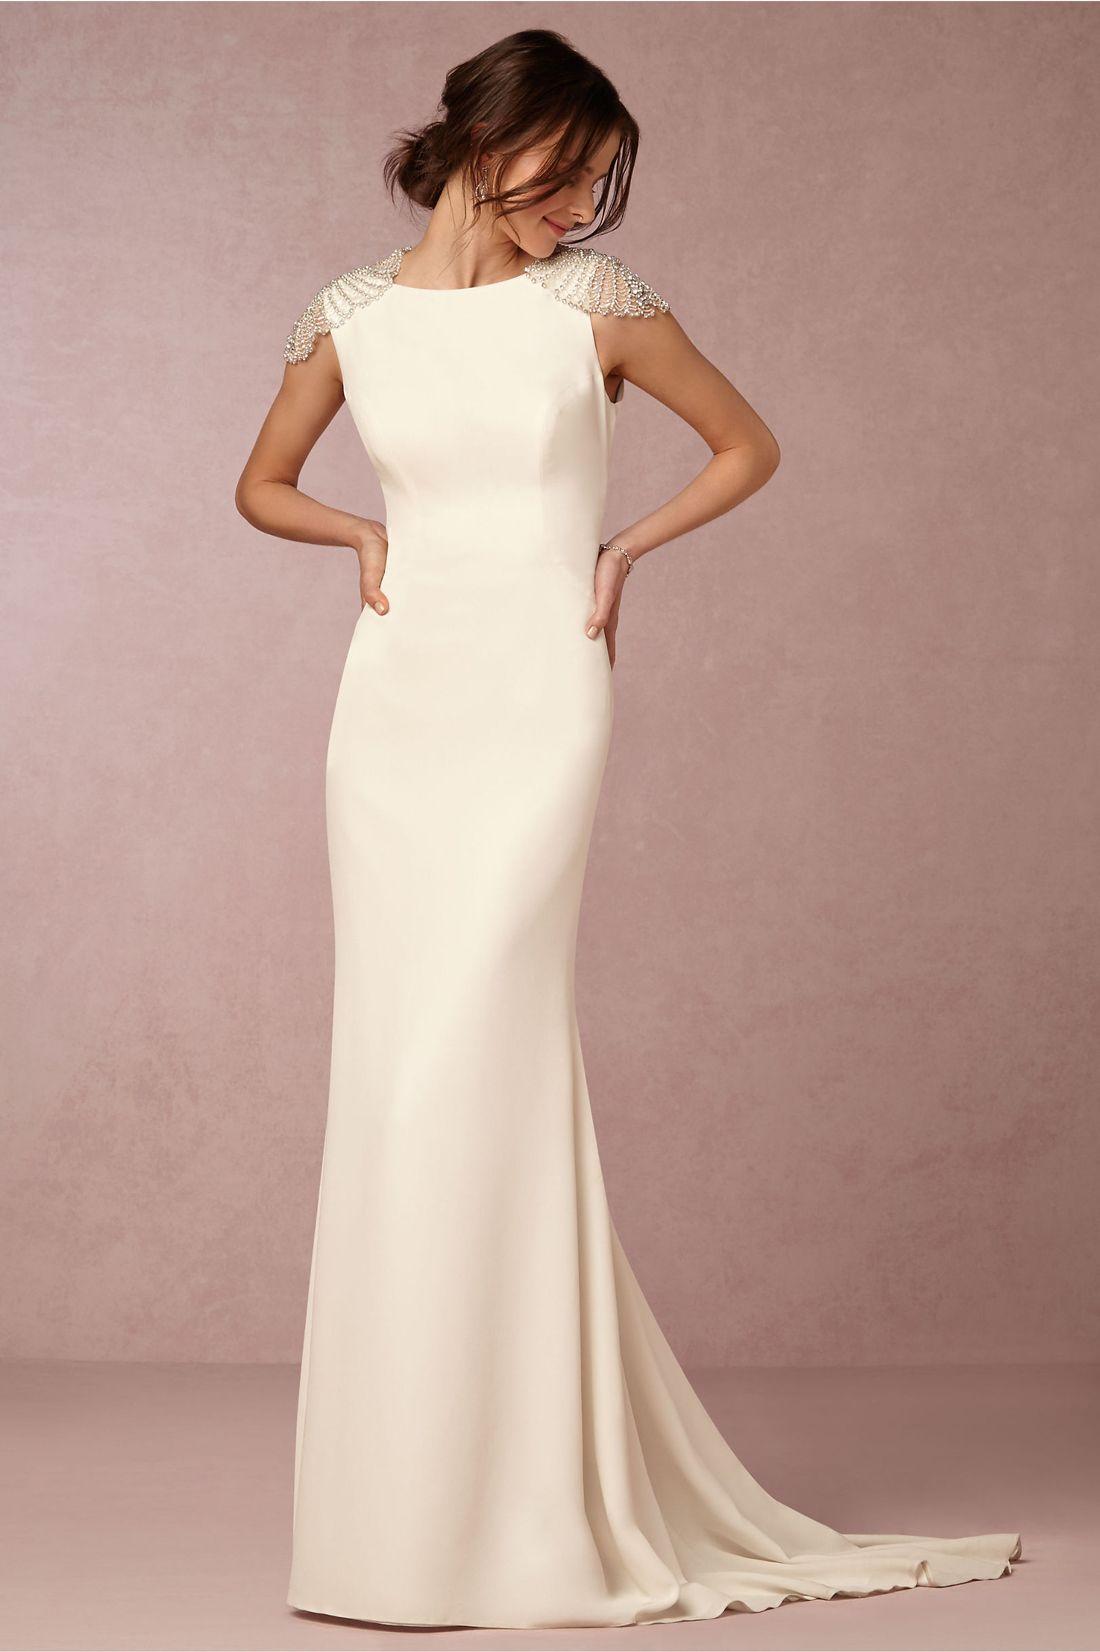 15 Beautiful Wedding Dresses Under $1000 | Folk, Wedding dress and Gowns